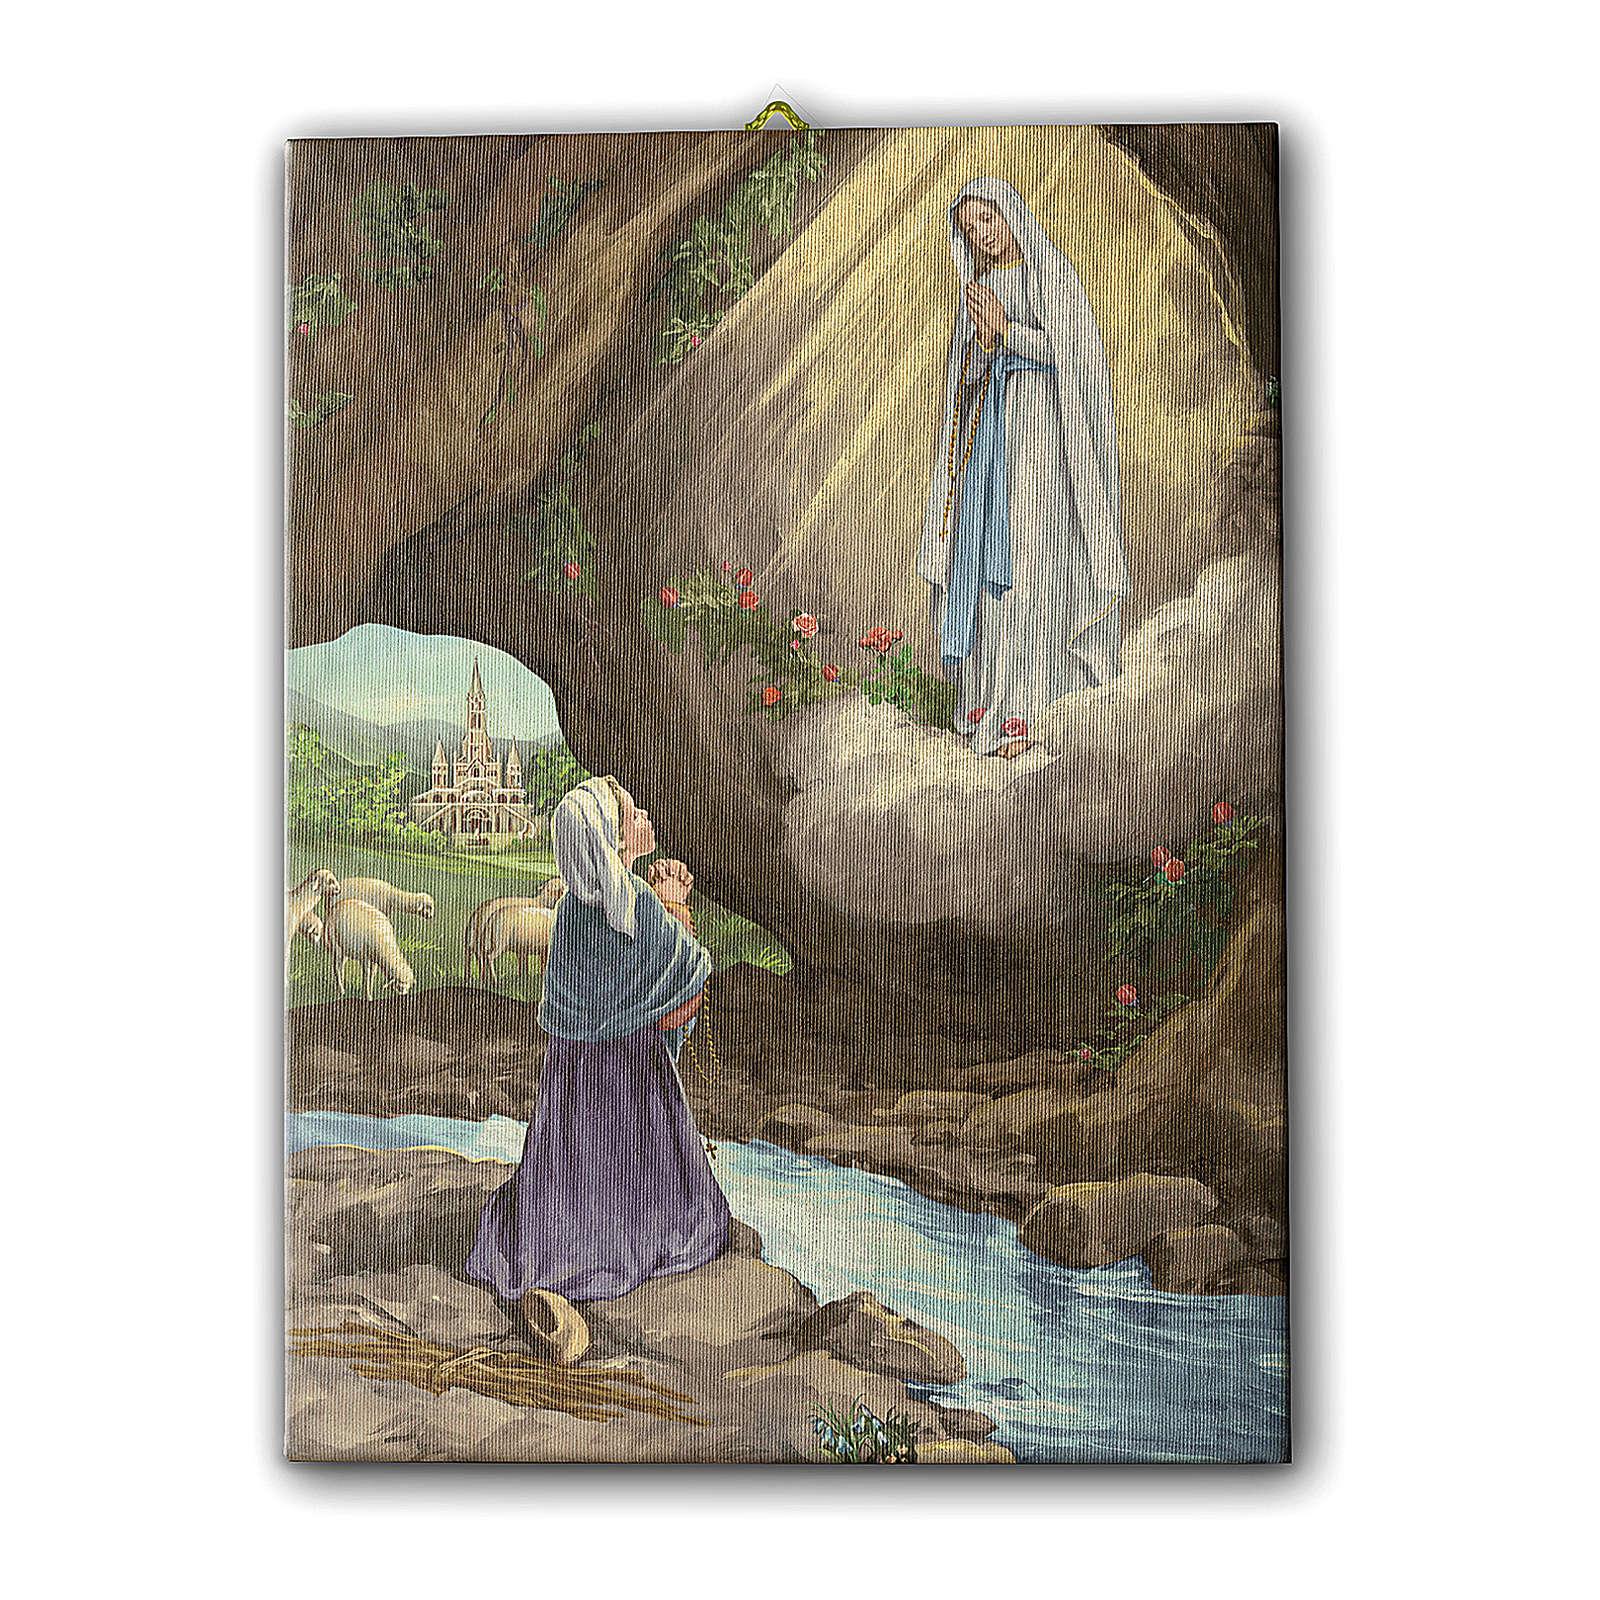 Cuadro sobre tela pictórica Aparición Lourdes con Bernadette 70x50 cm 3